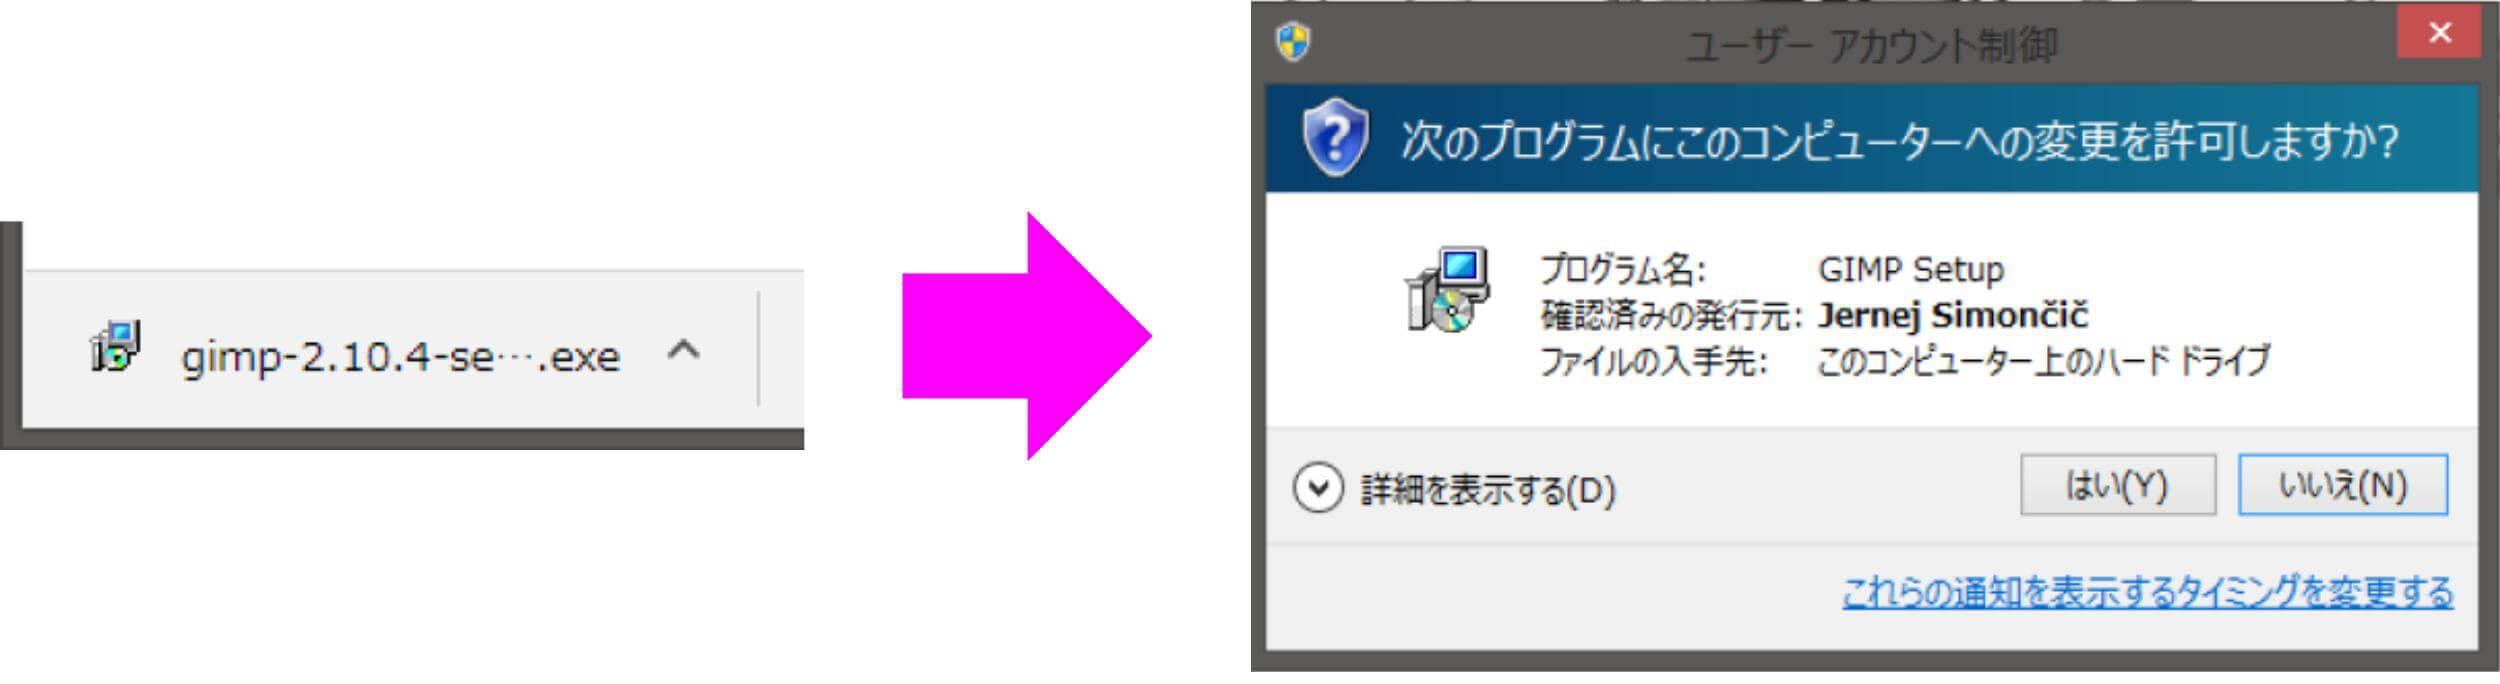 GIMP2のダウンロード UAC